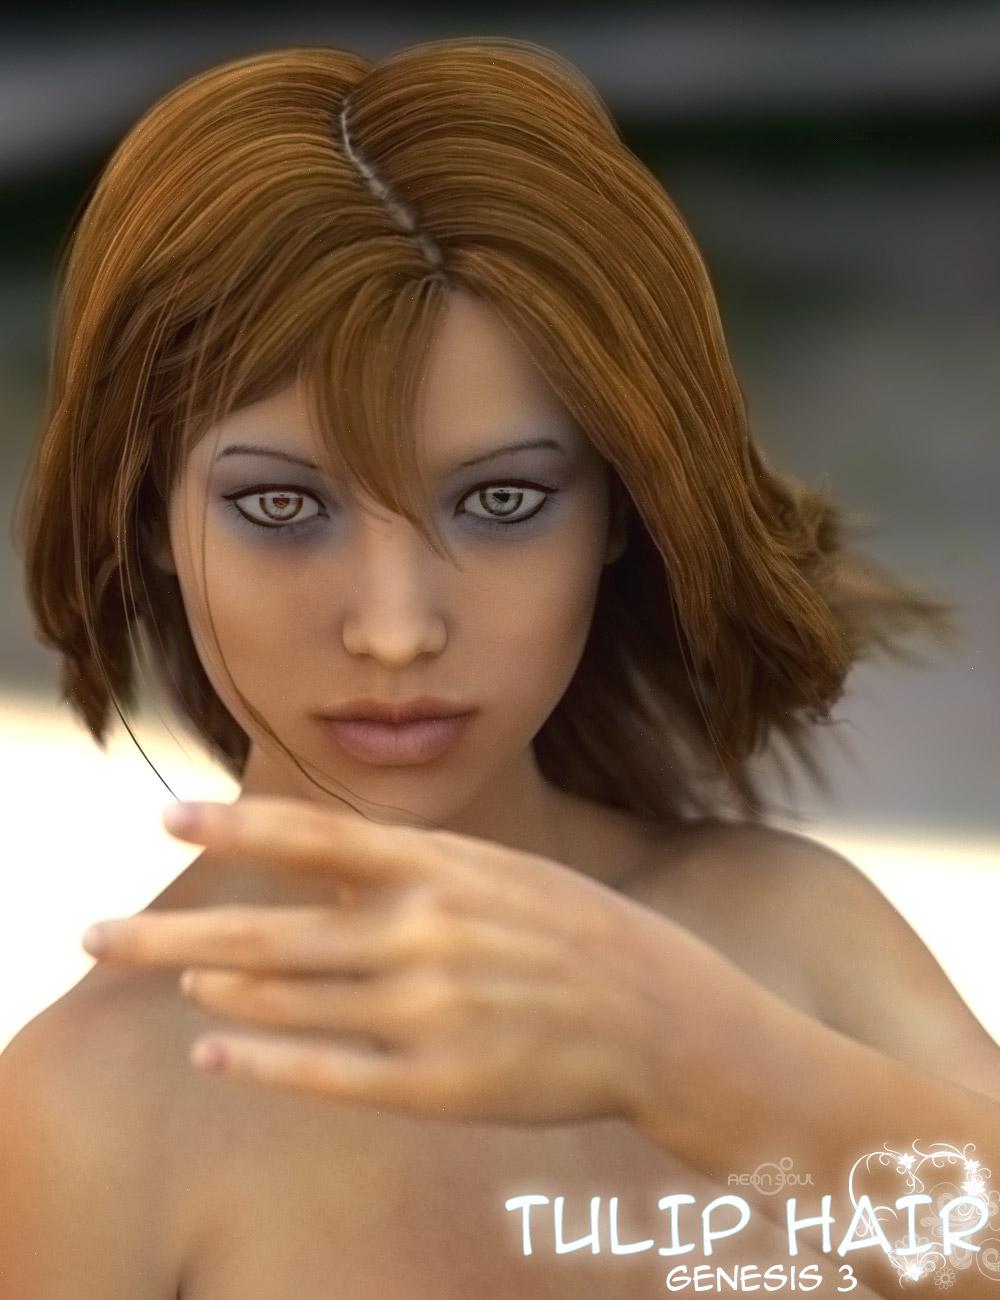 Tulip Hair for Genesis 3 Female(s) by: Aeon Soul, 3D Models by Daz 3D